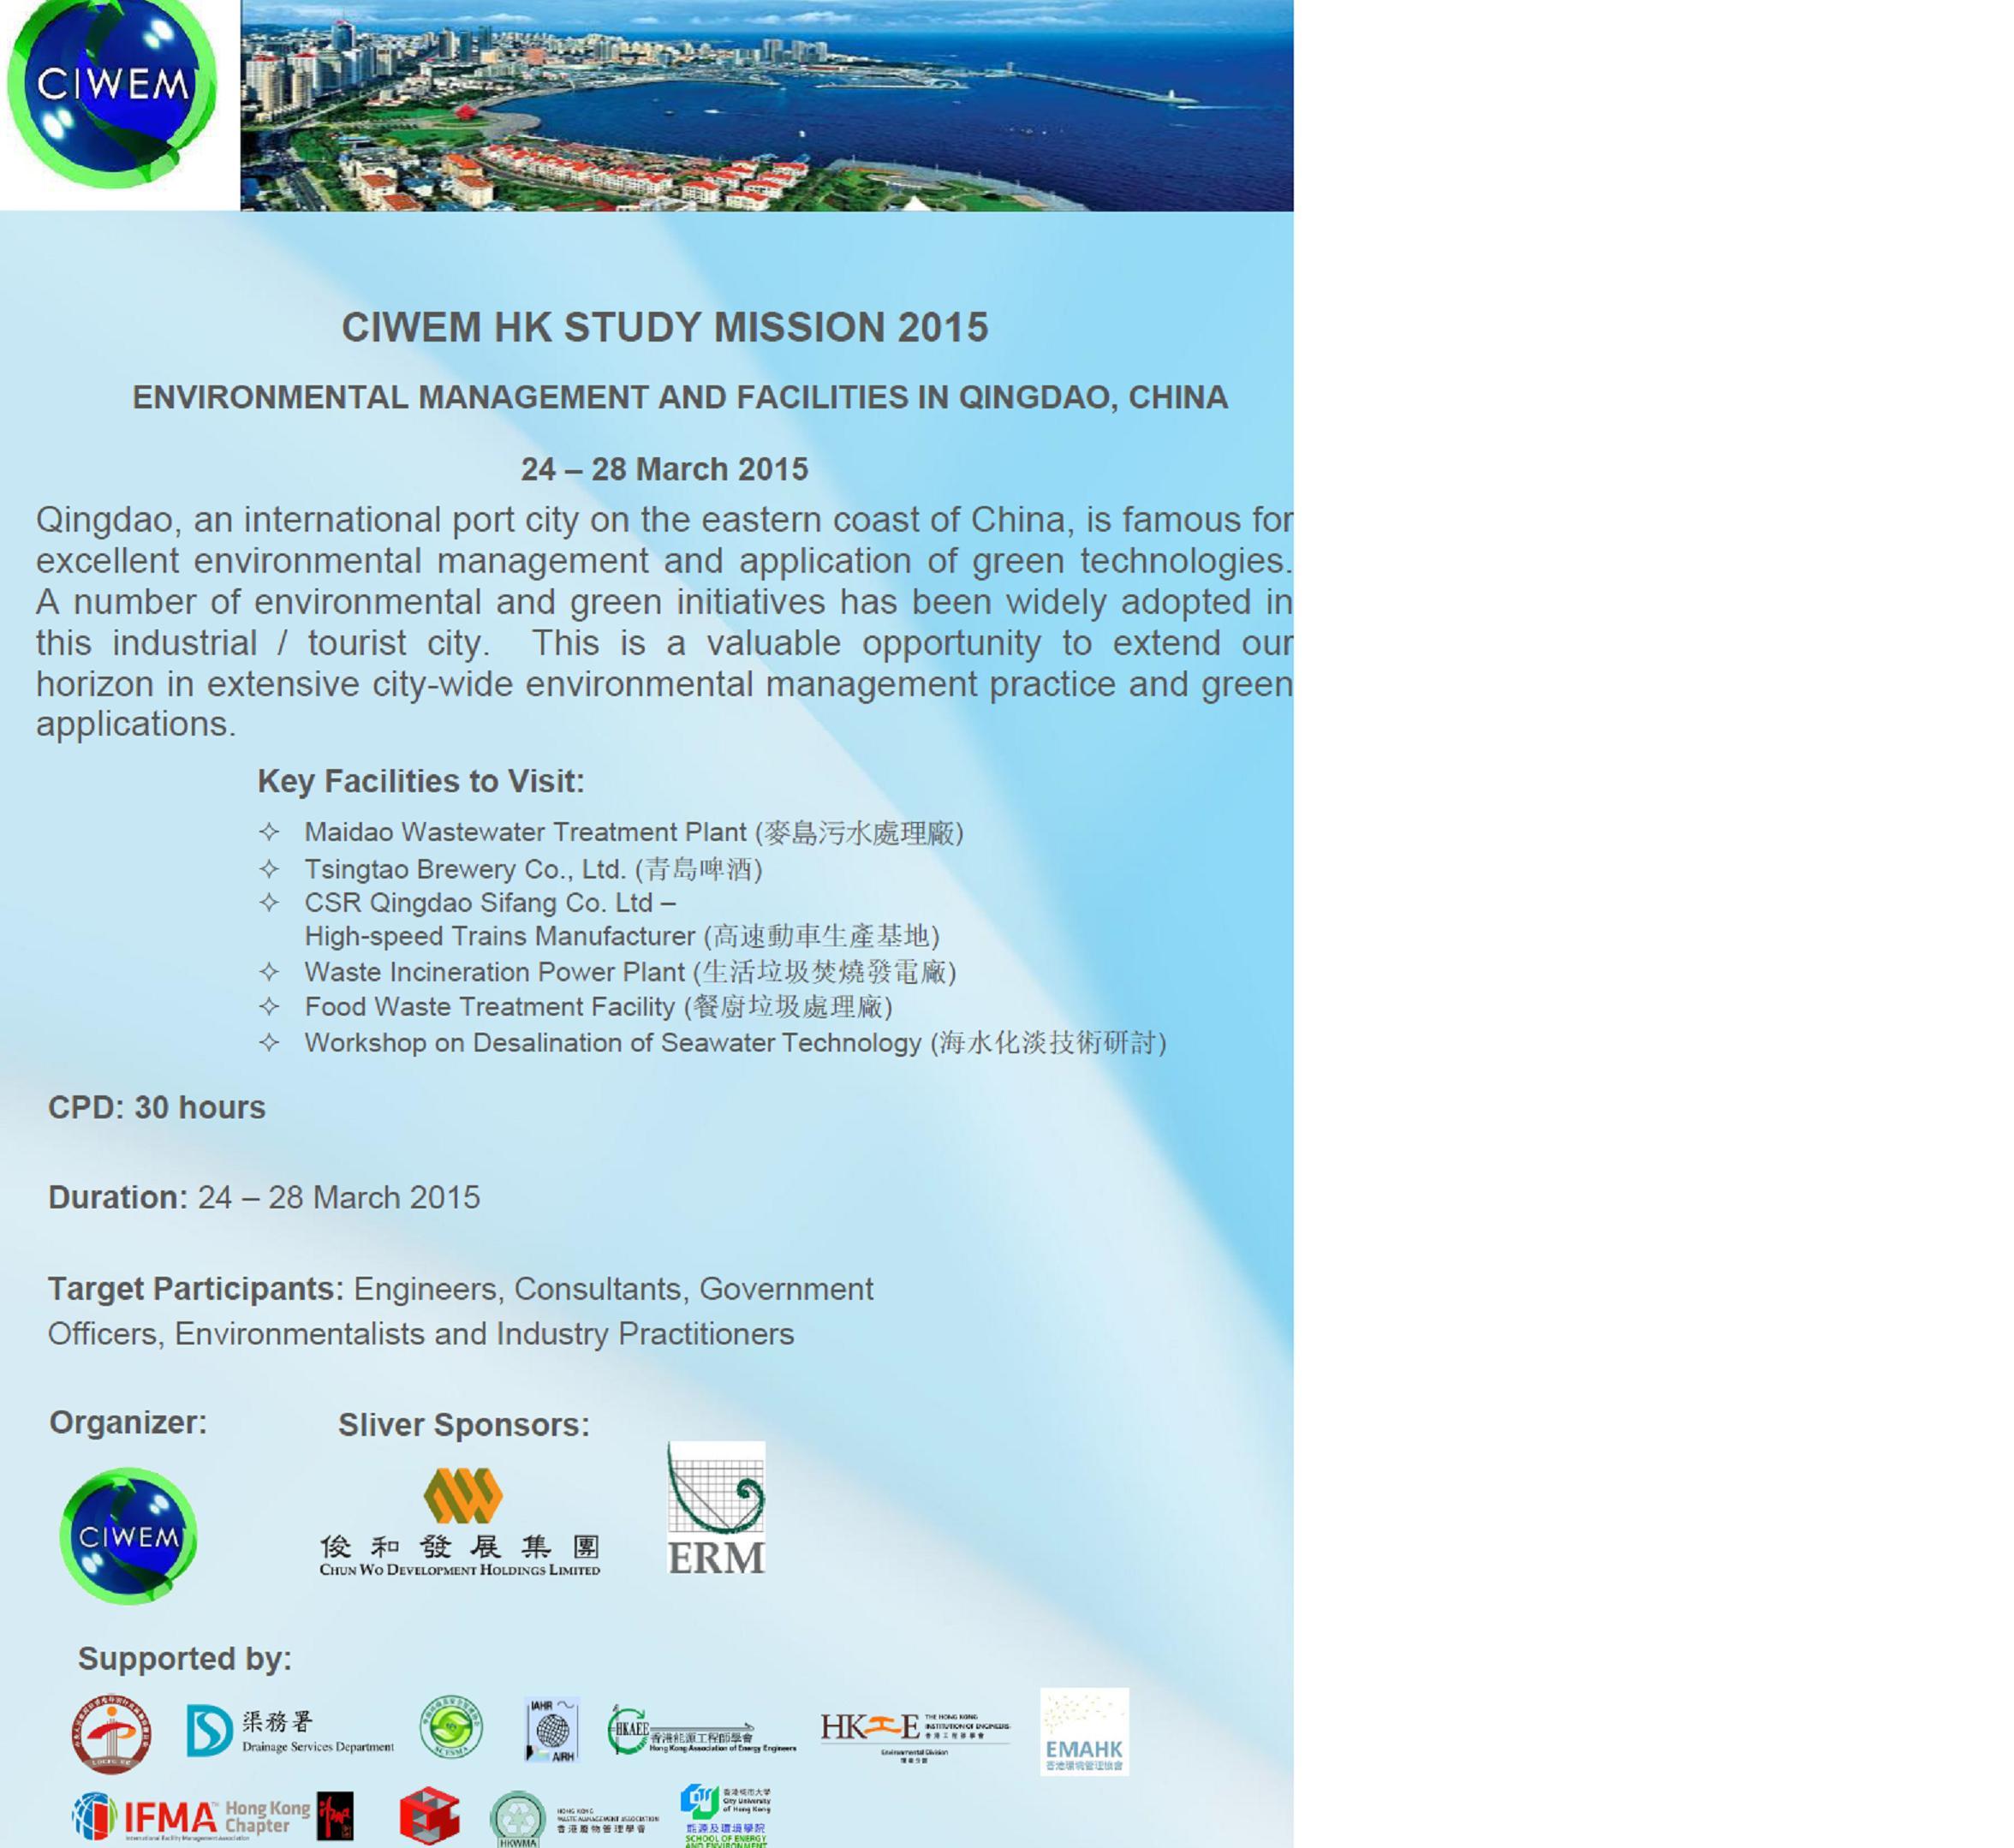 CIWEM HK study mission 2015